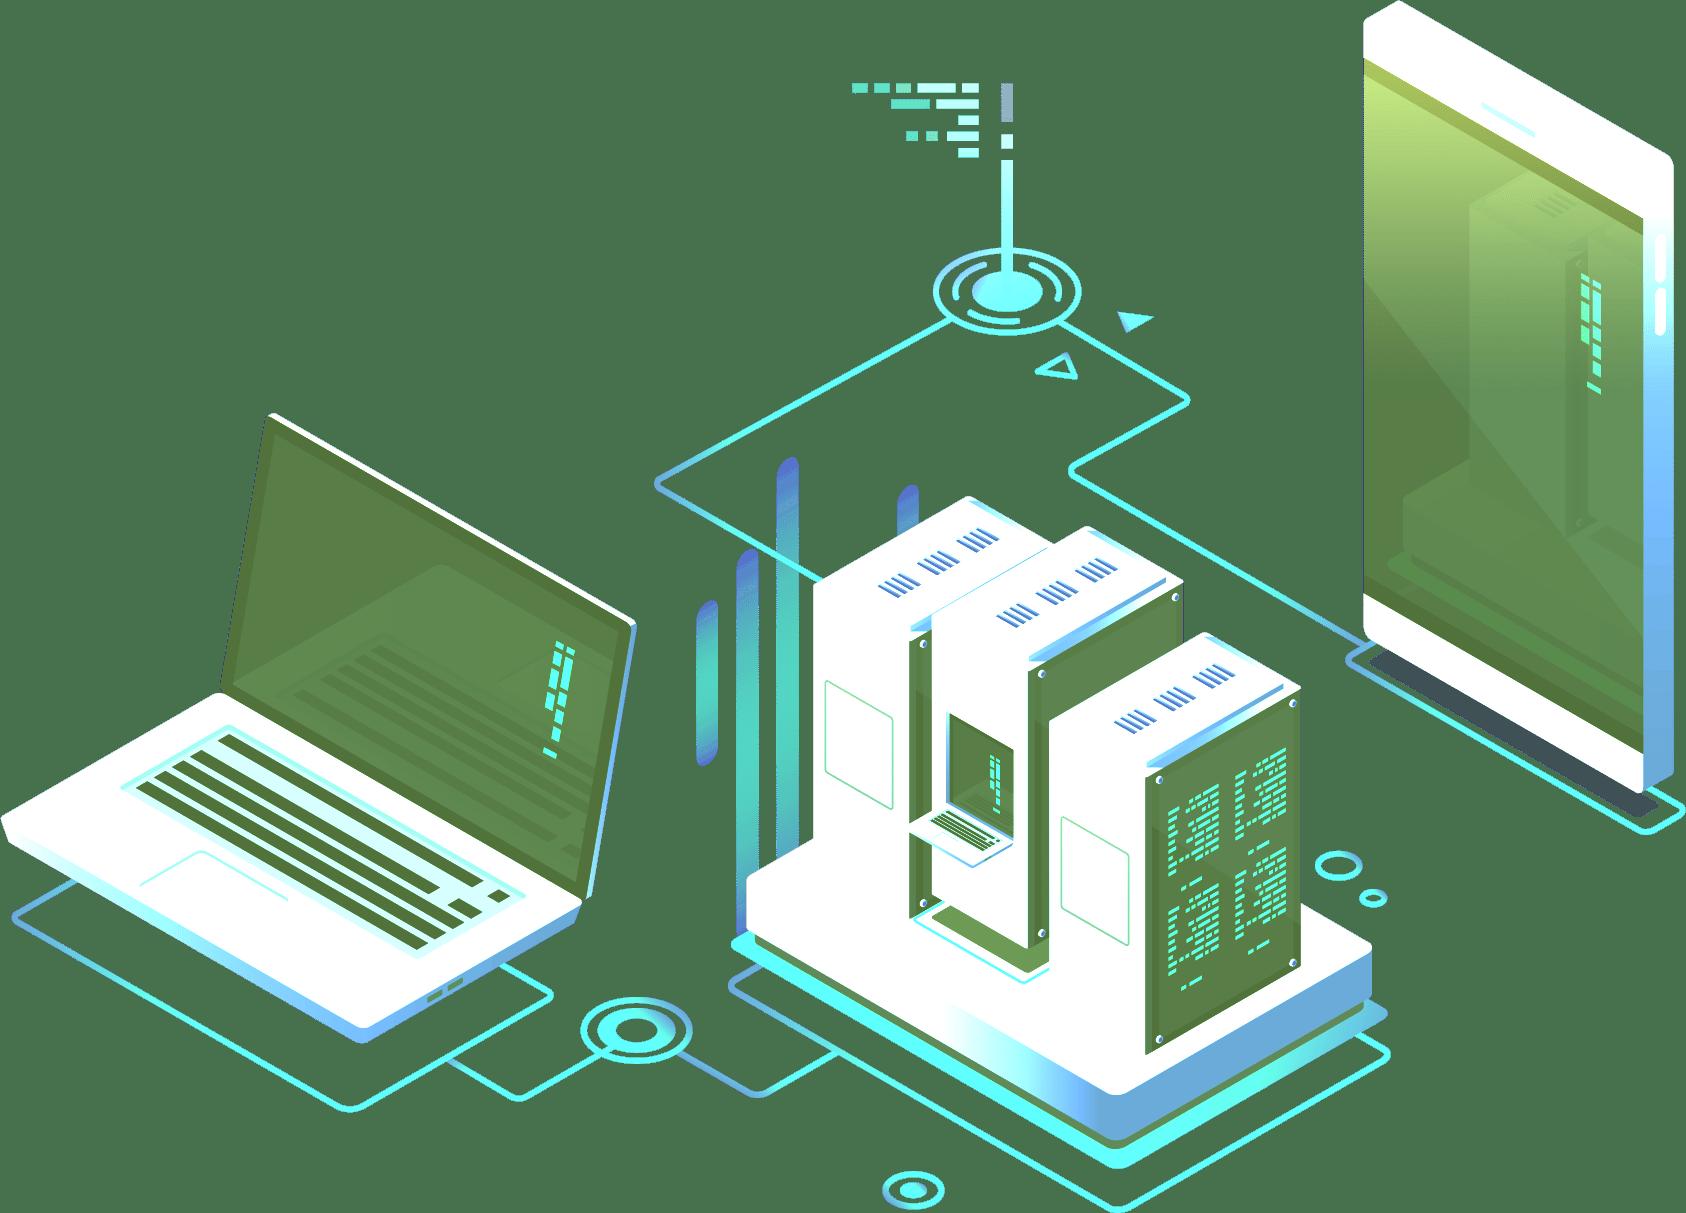 UonCloud Data Center illustration